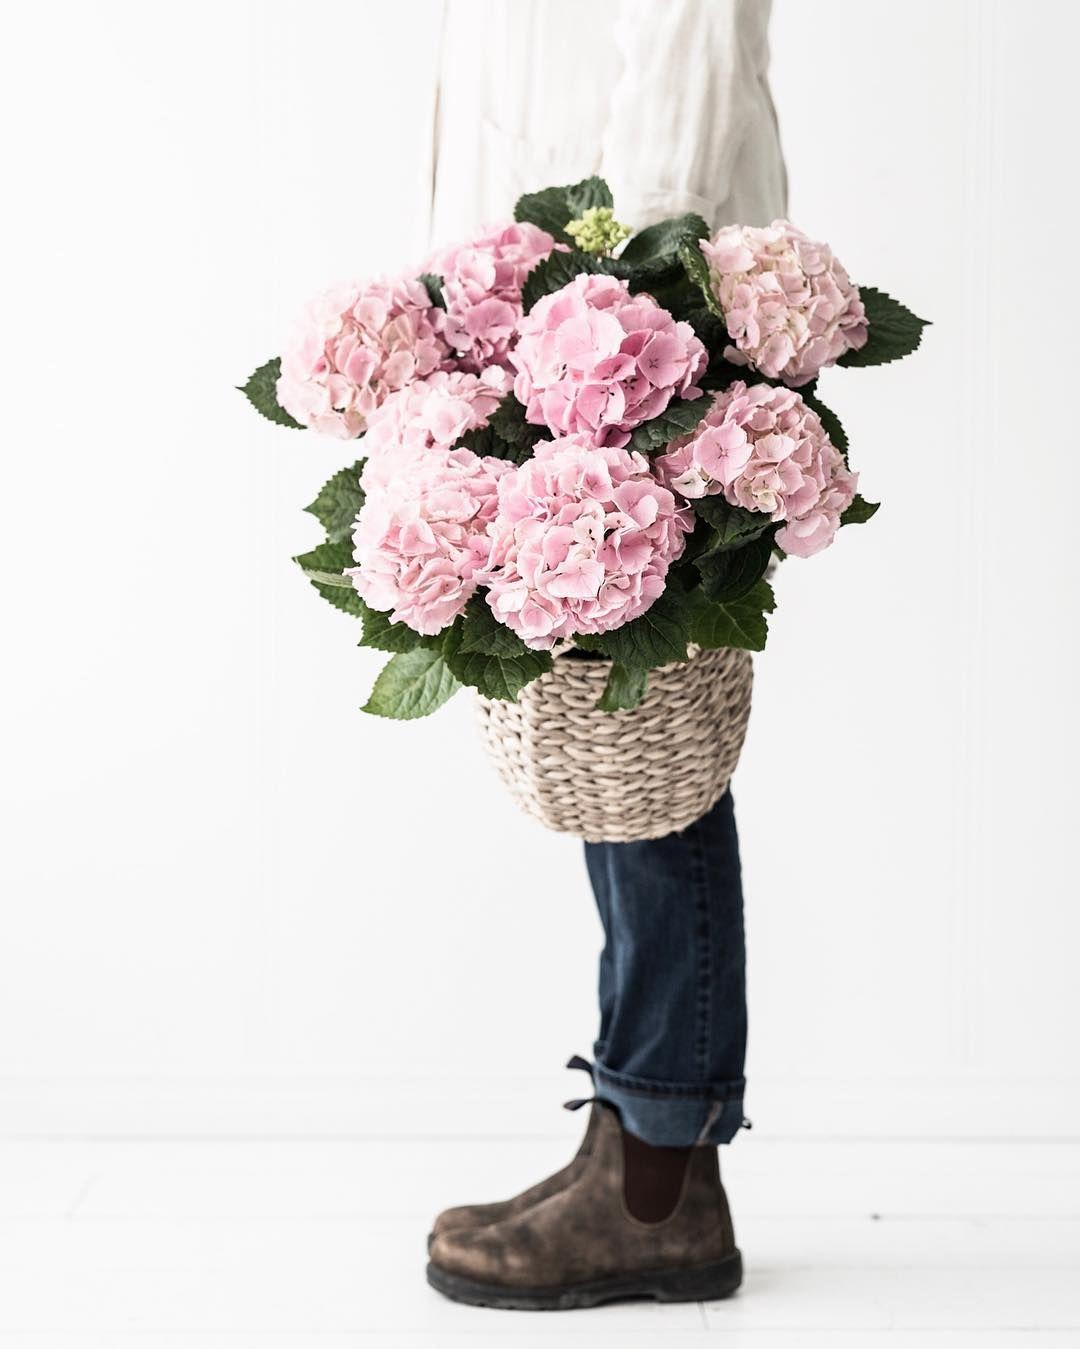 Pin by michelle on bloom Bloom, Pink hydrangea, Flowers